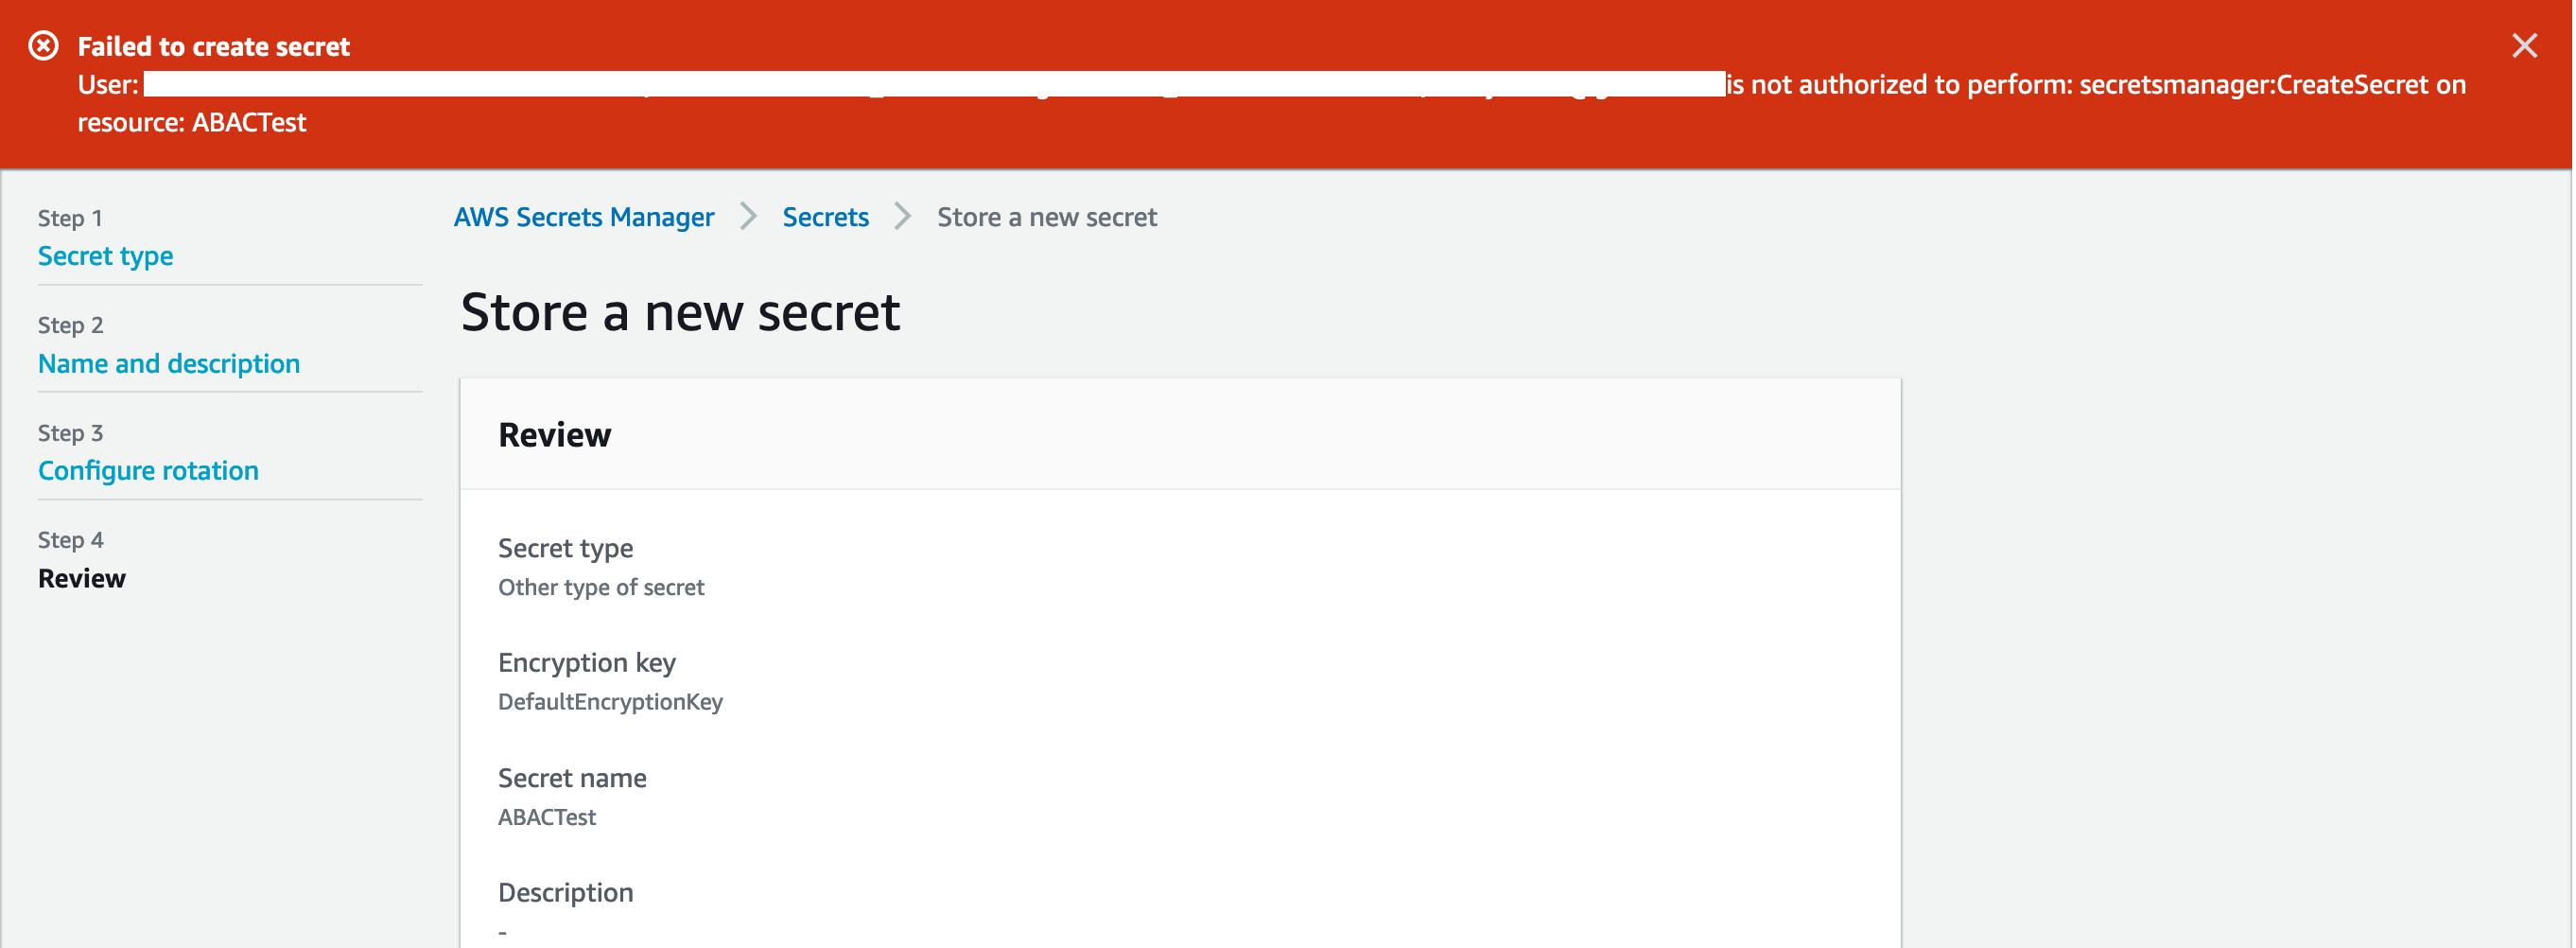 Figure 7: Failure to create a secret (no attributes)